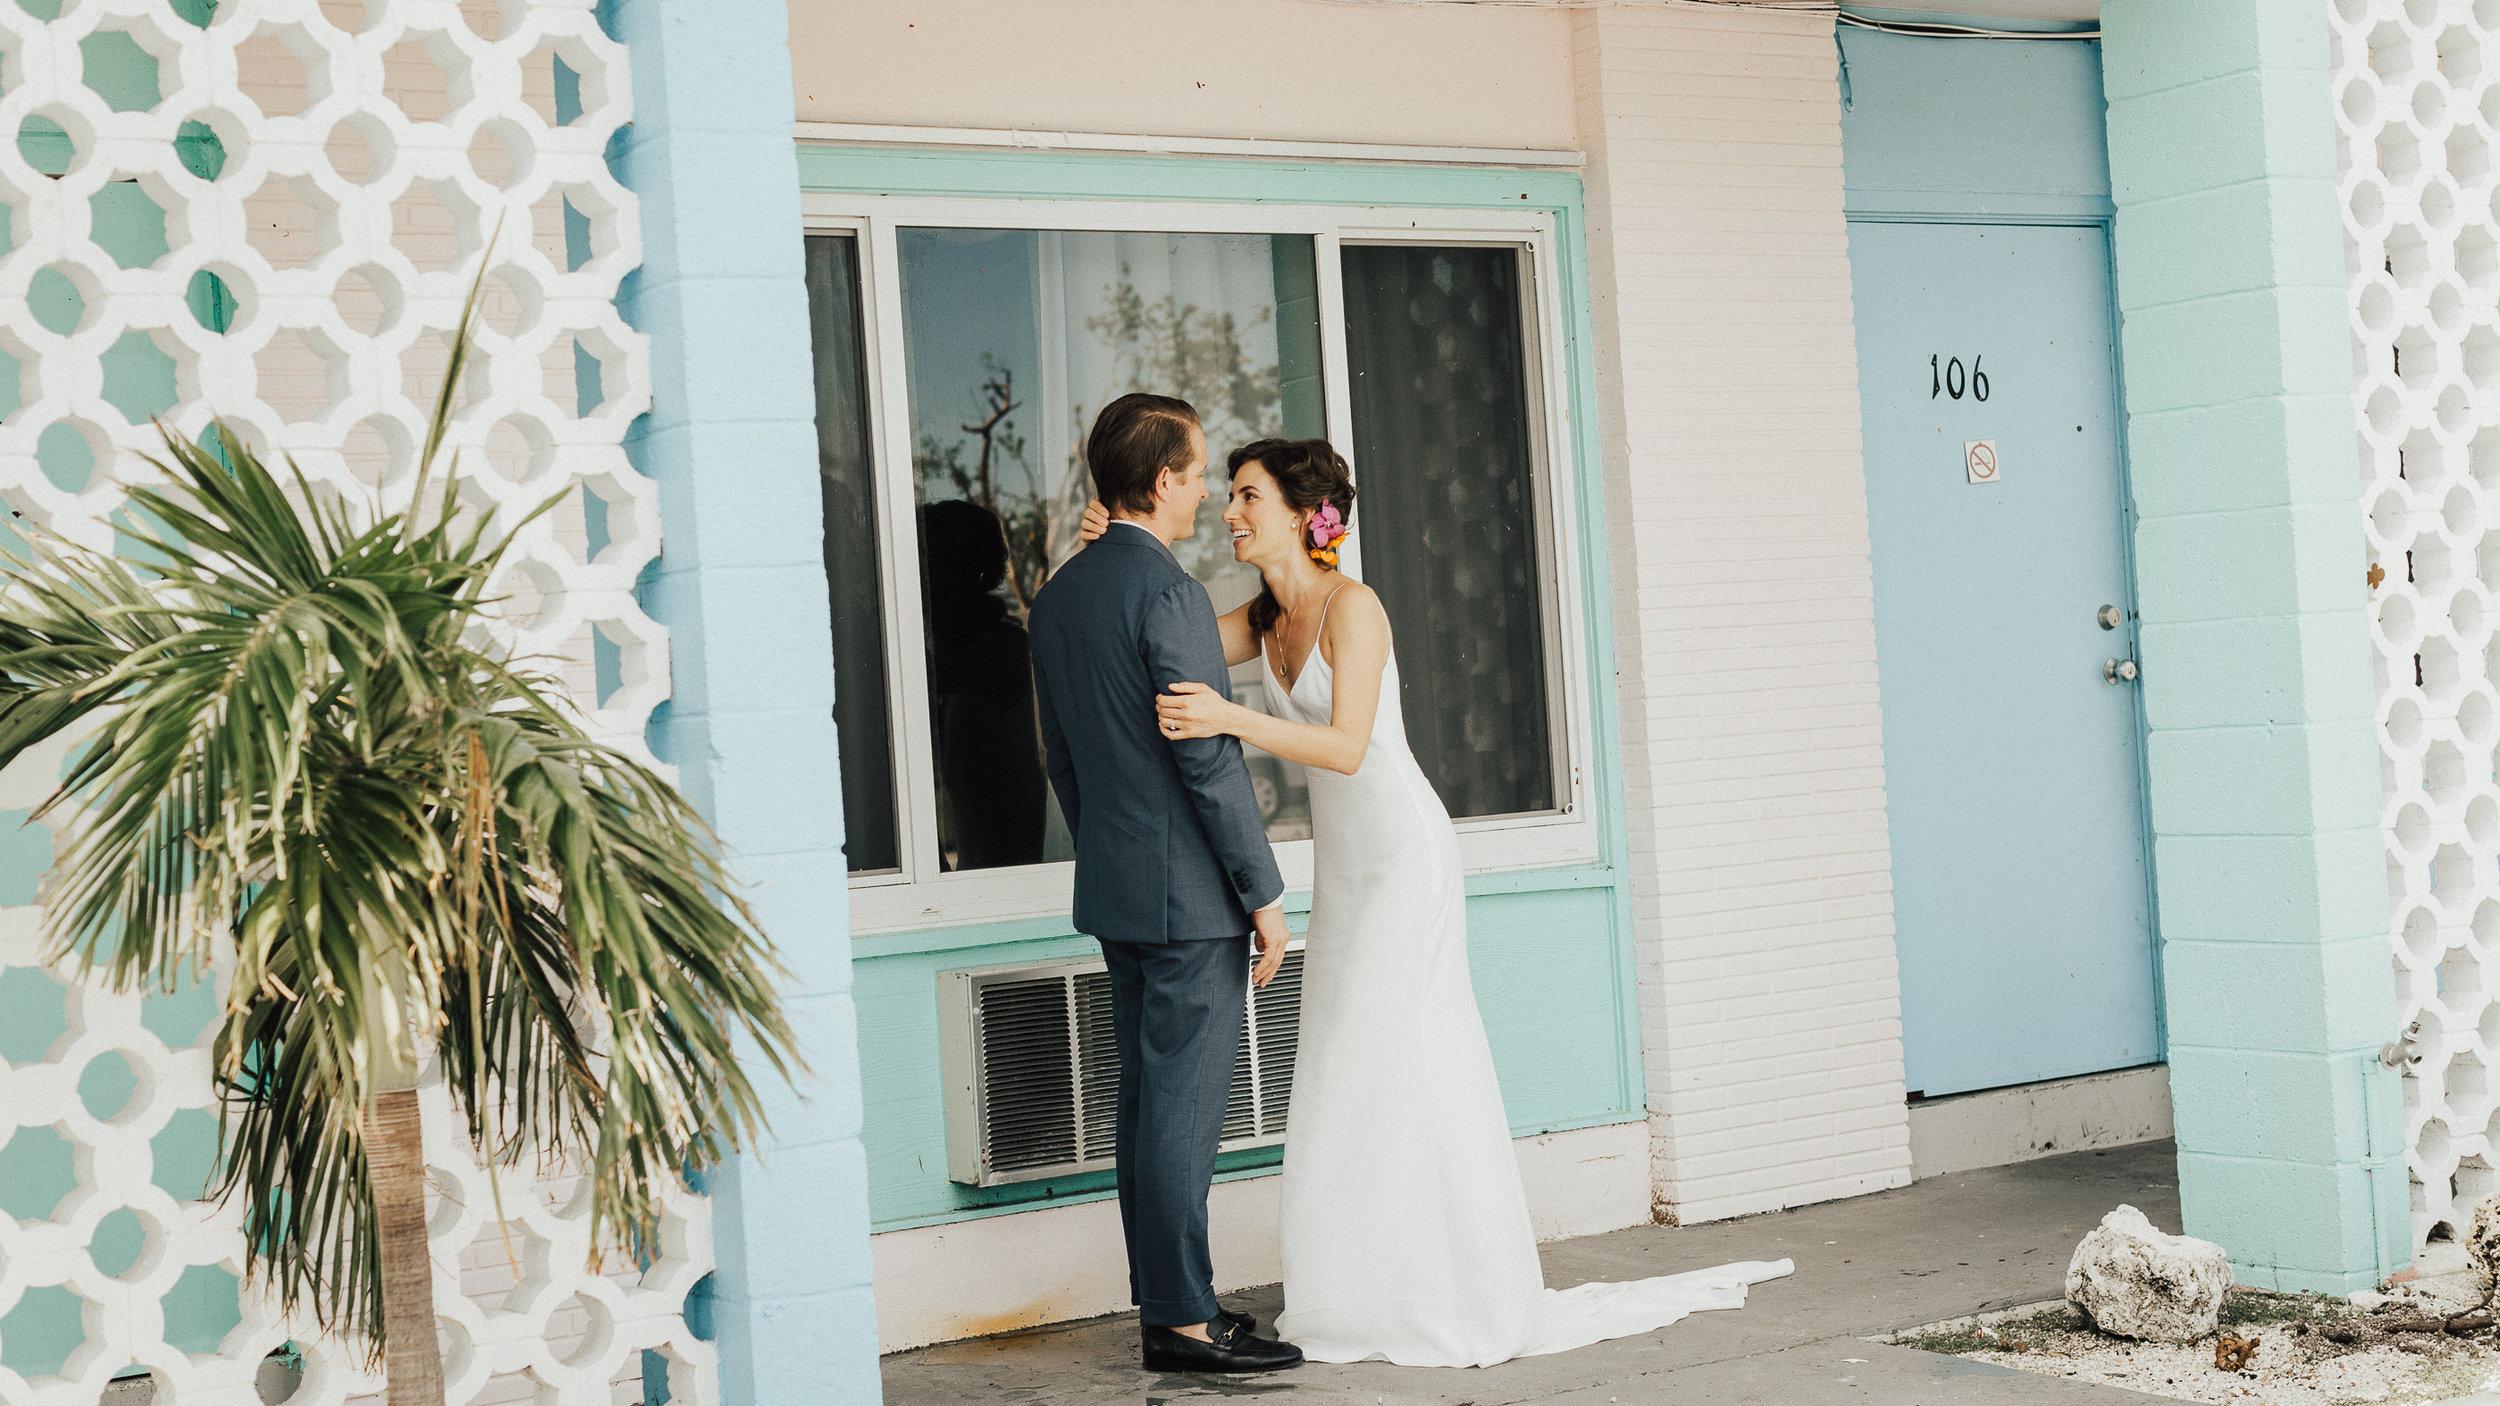 Gianna Keiko Destination Wedding Photographer.jpg